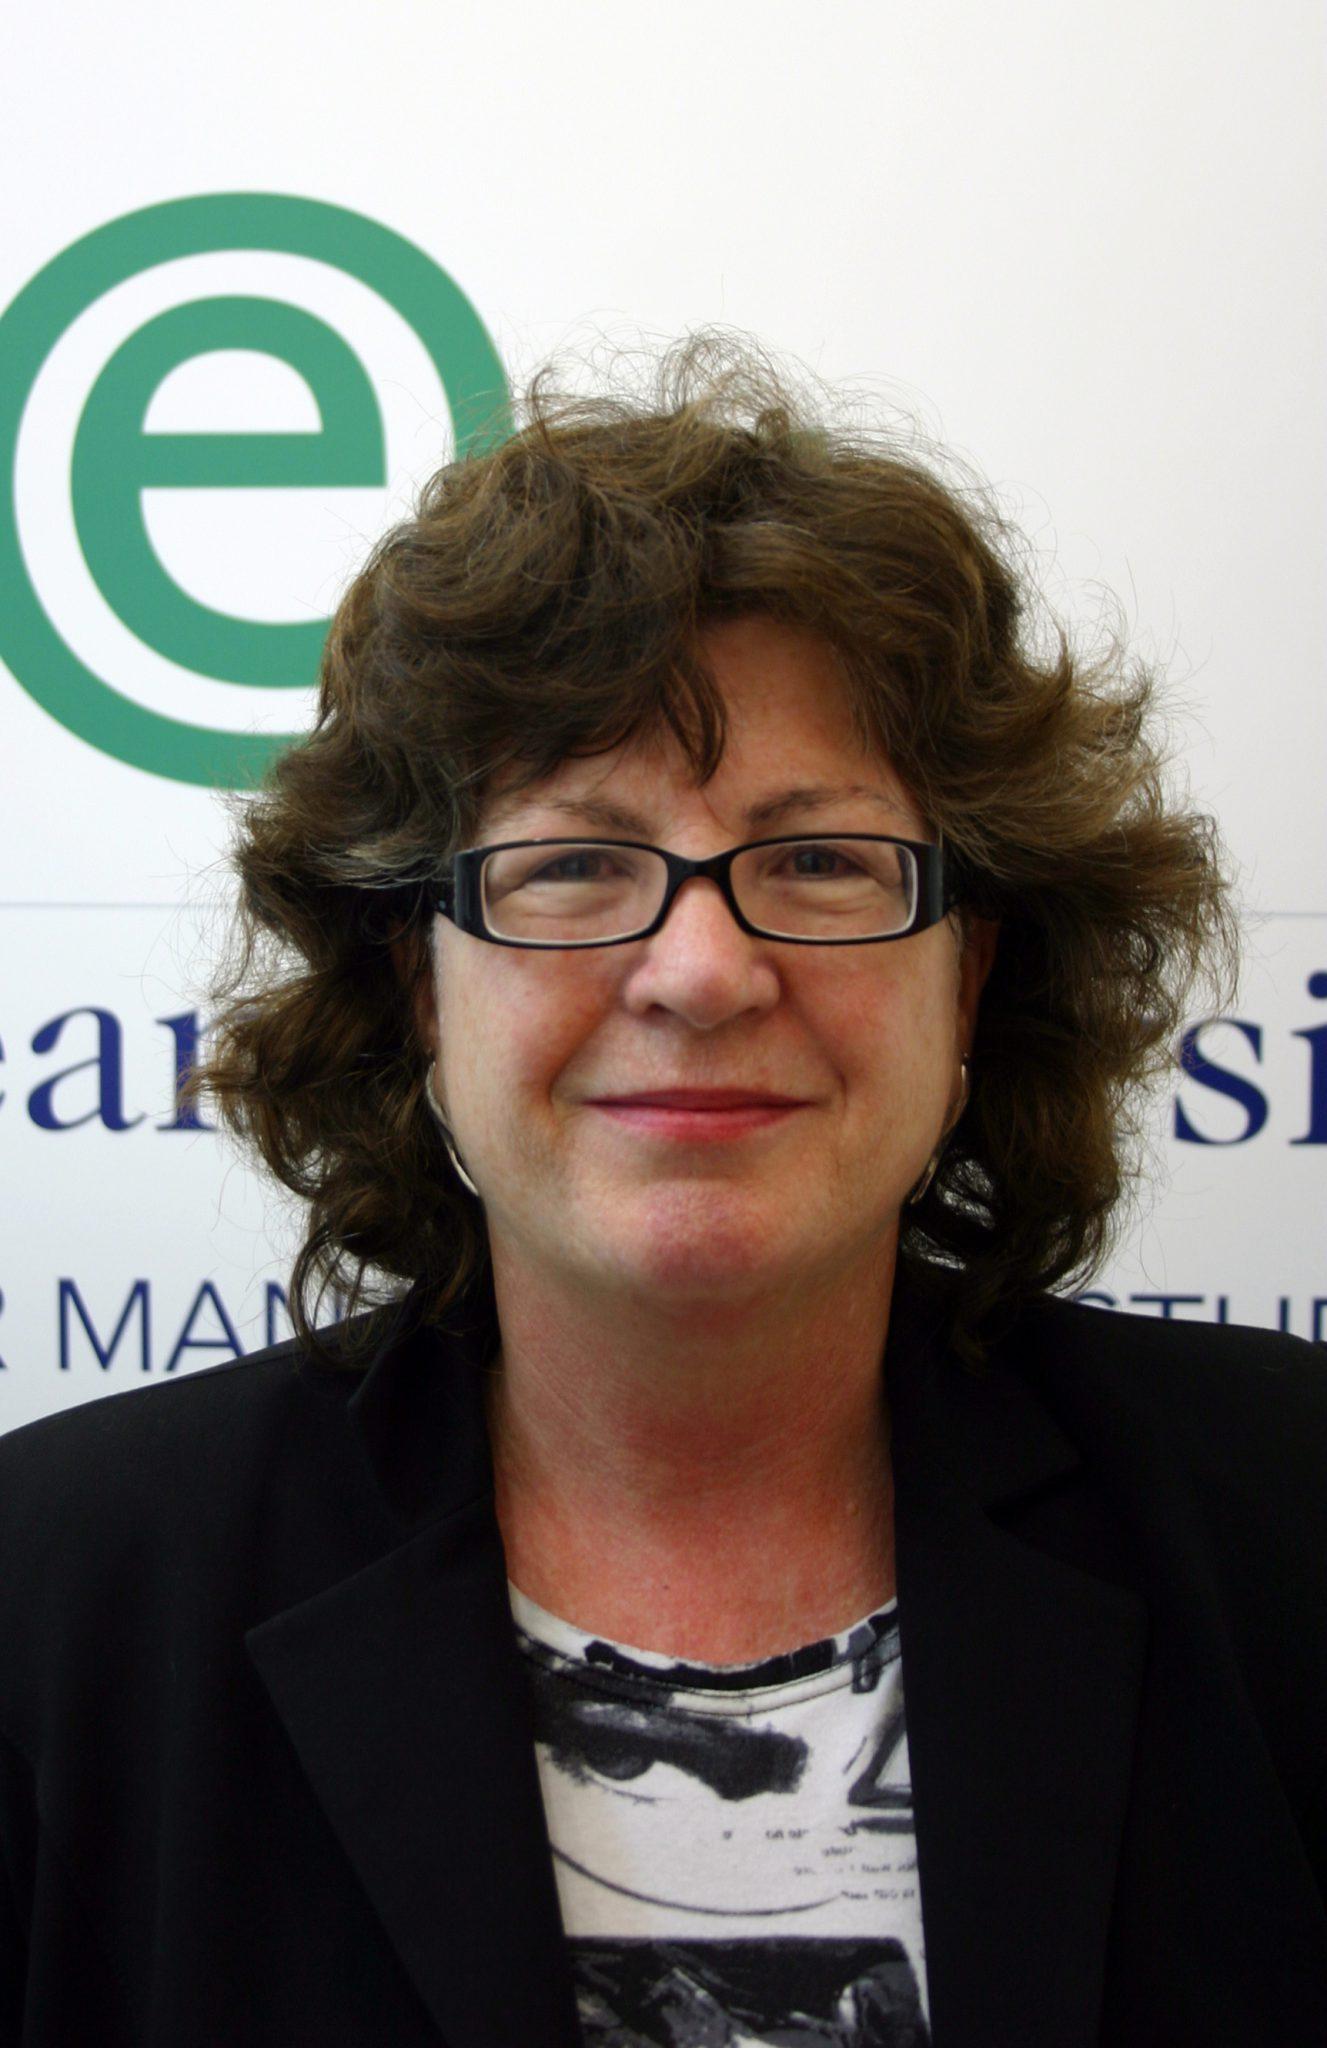 Meet our Faculty: Anne Dwyer